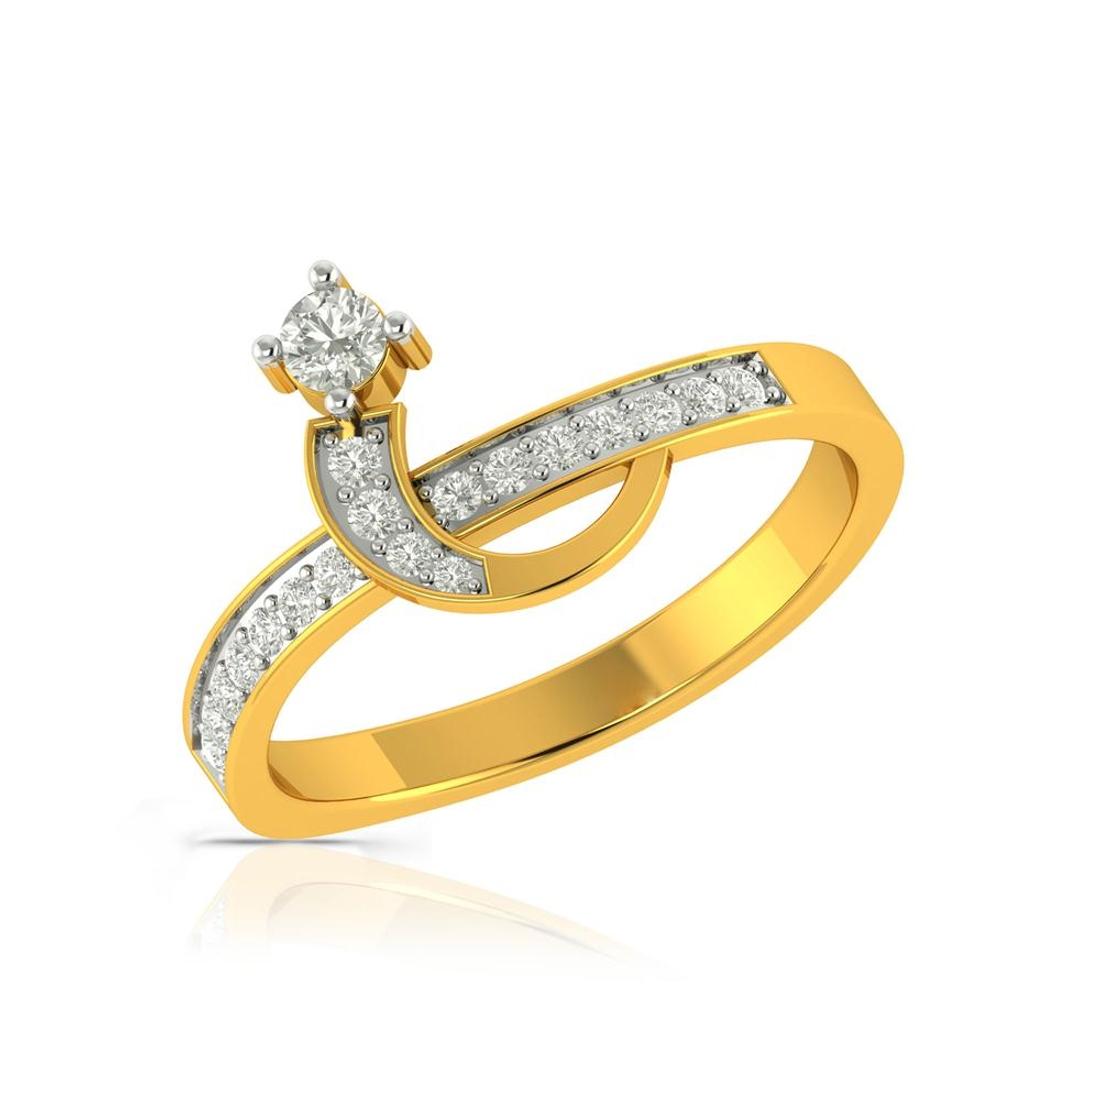 Buy Charu Jewels Diamond Ladies Ring CJLR0241 Online in India